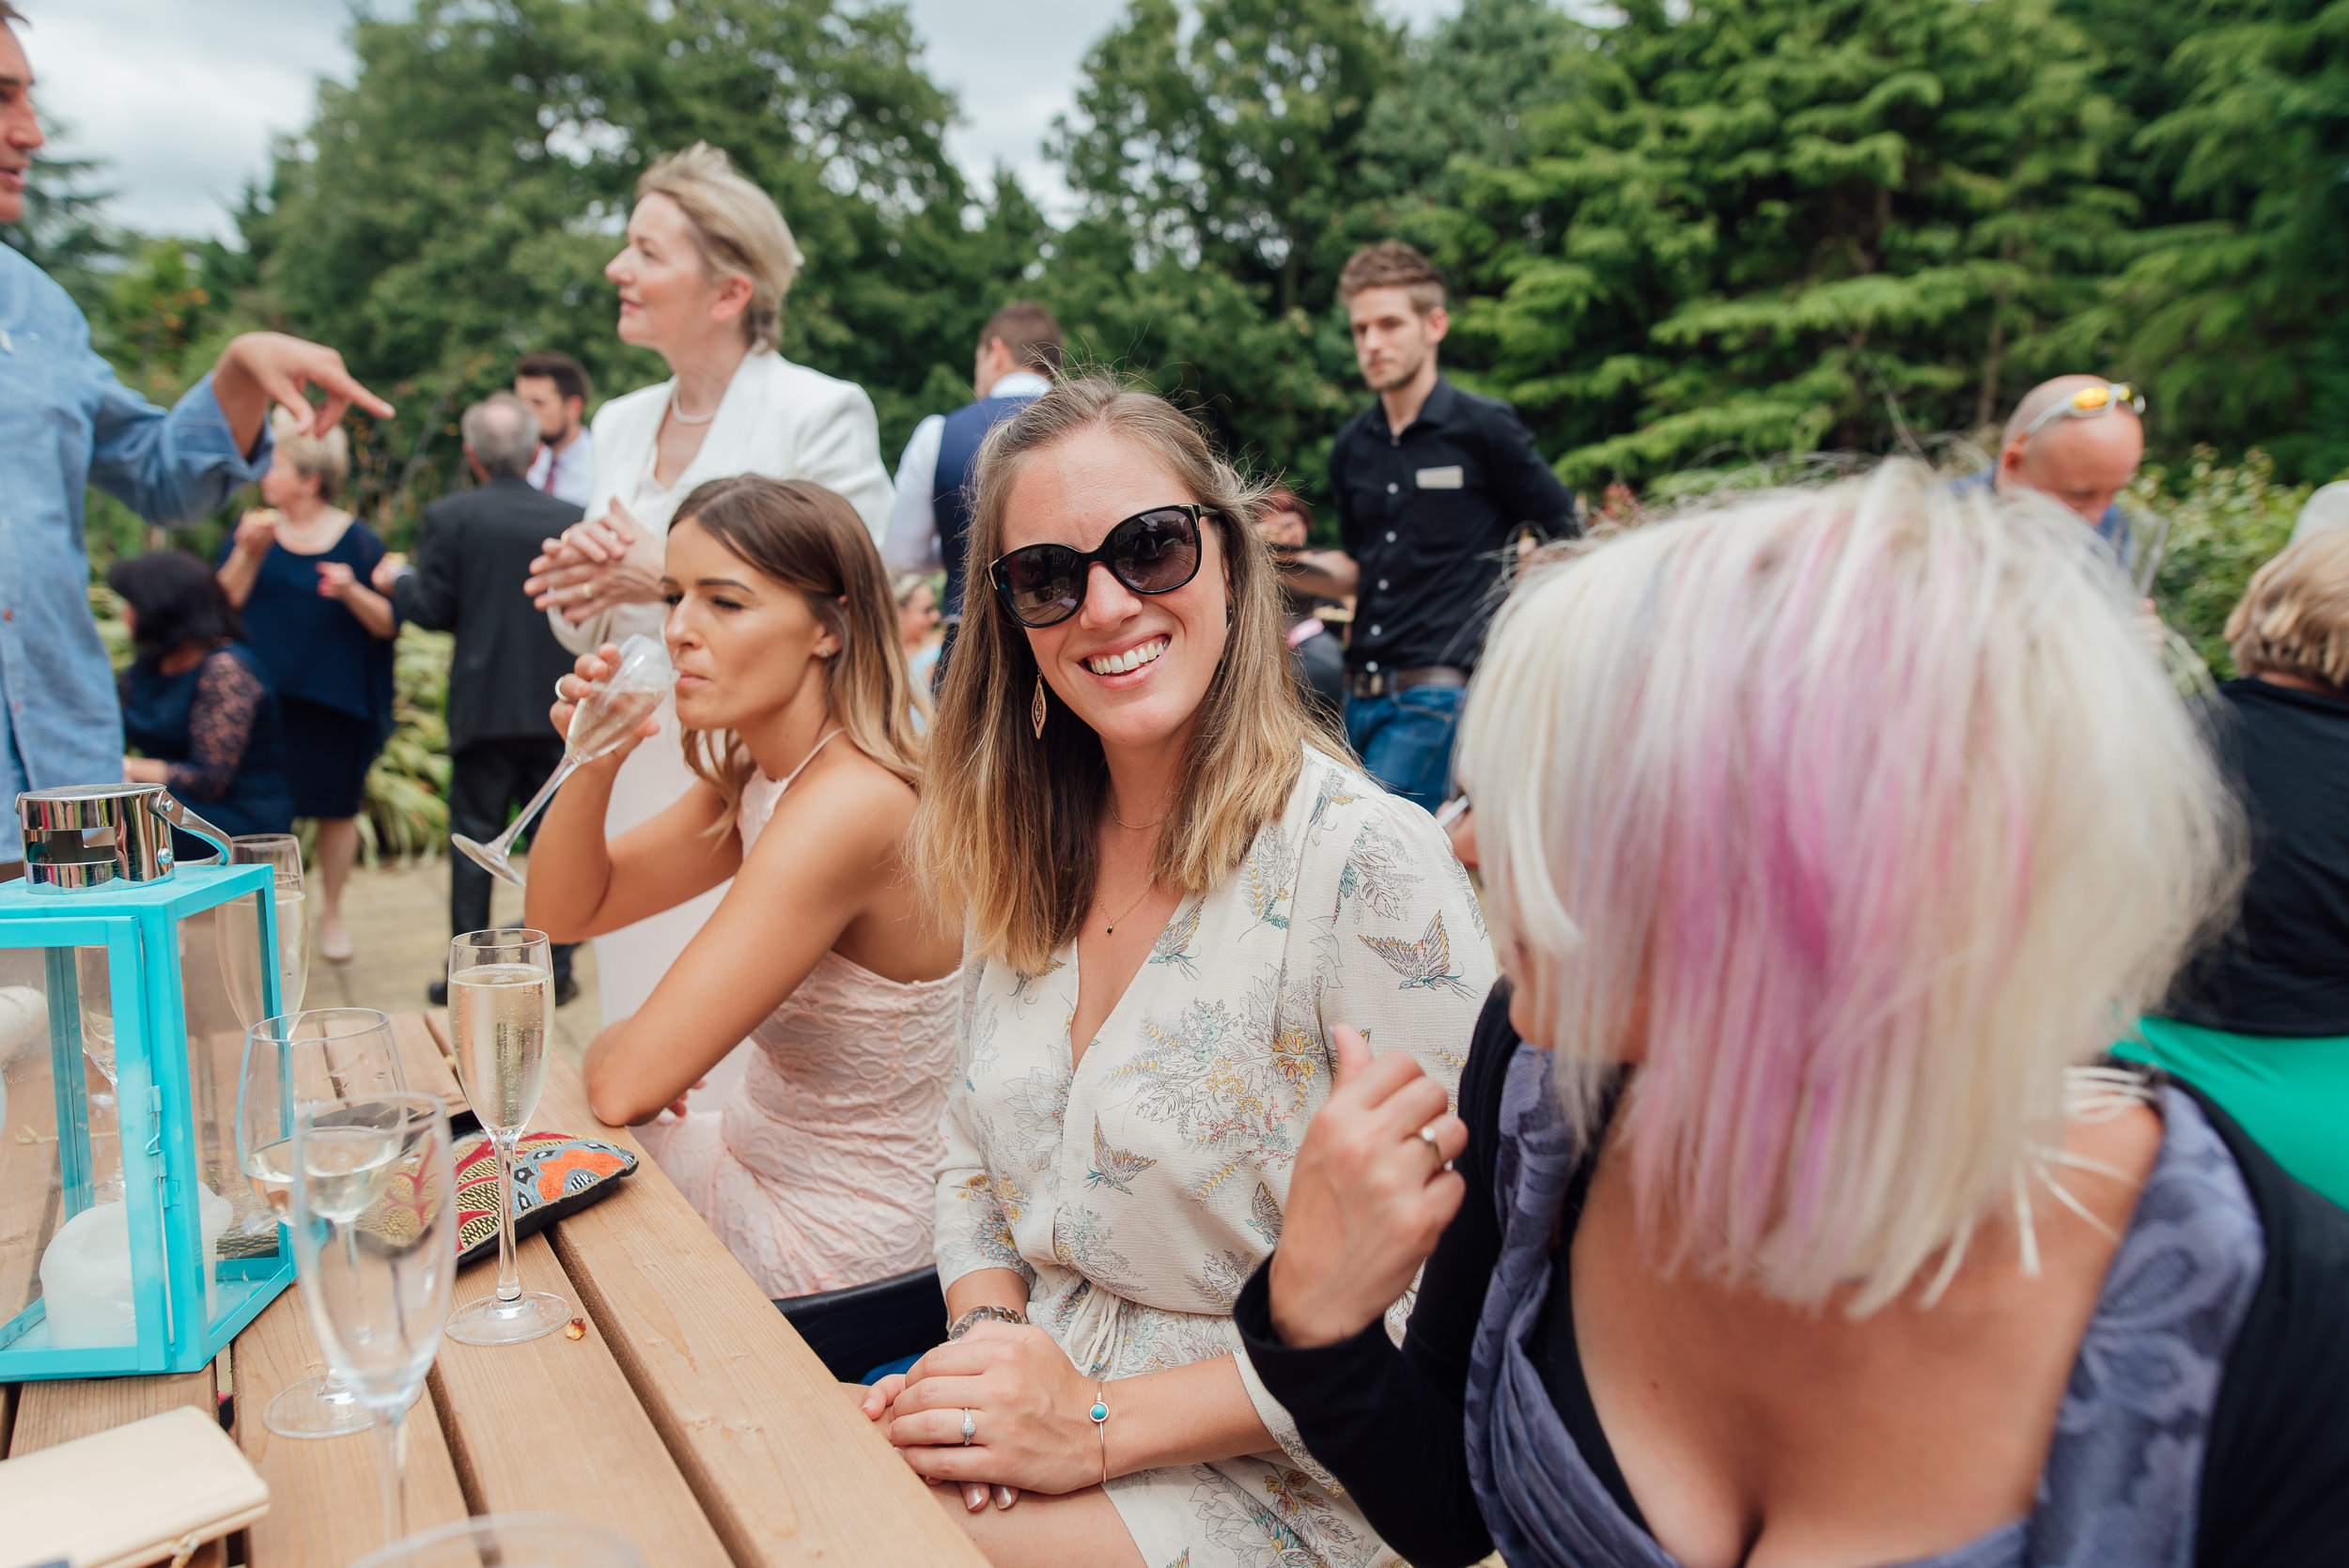 Hampshire-wedding-photographer : Amy-james-photography : Surrey-wedding-photographer : Fleet-wedding-photographer : Worplesdon-Place-Wedding : Worplesdon-place-wedding-photographer : documentary-wedding-photographer-hampshire-surrey-berkshire-700.jpg